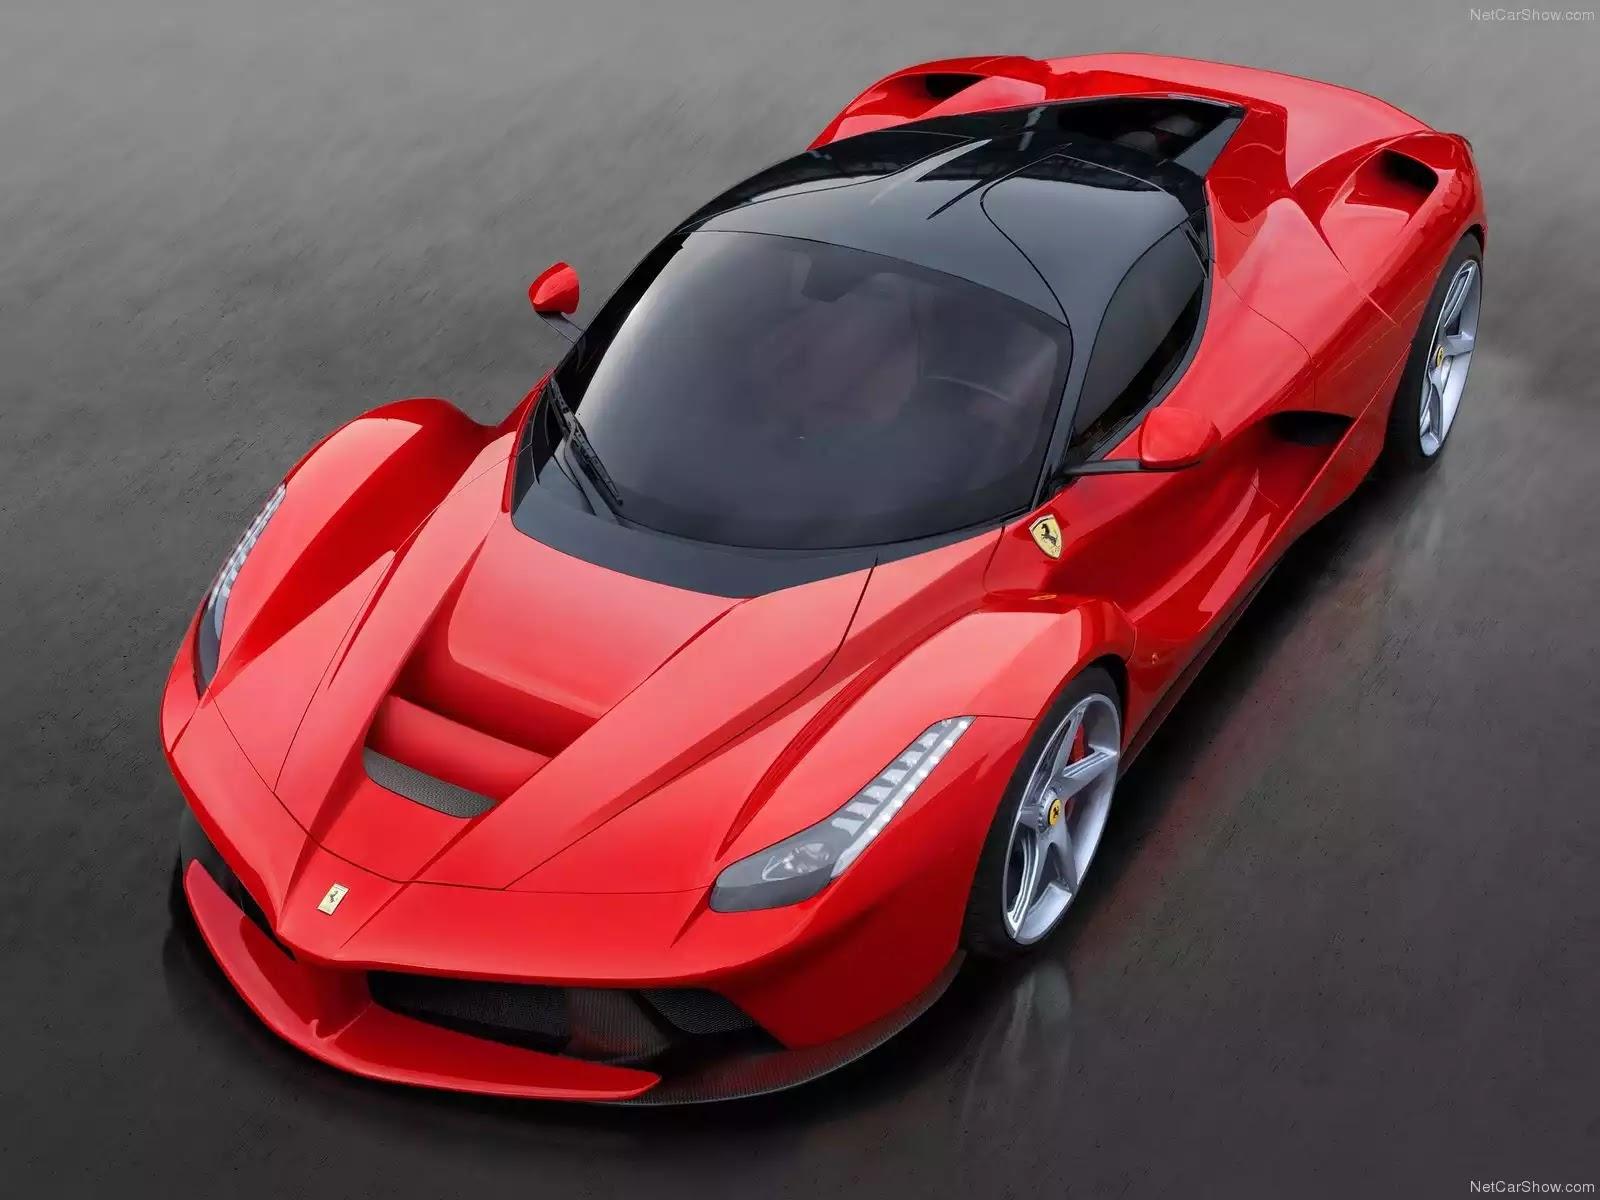 Hình ảnh siêu xe Ferrari LaFerrari 2014 & nội ngoại thất